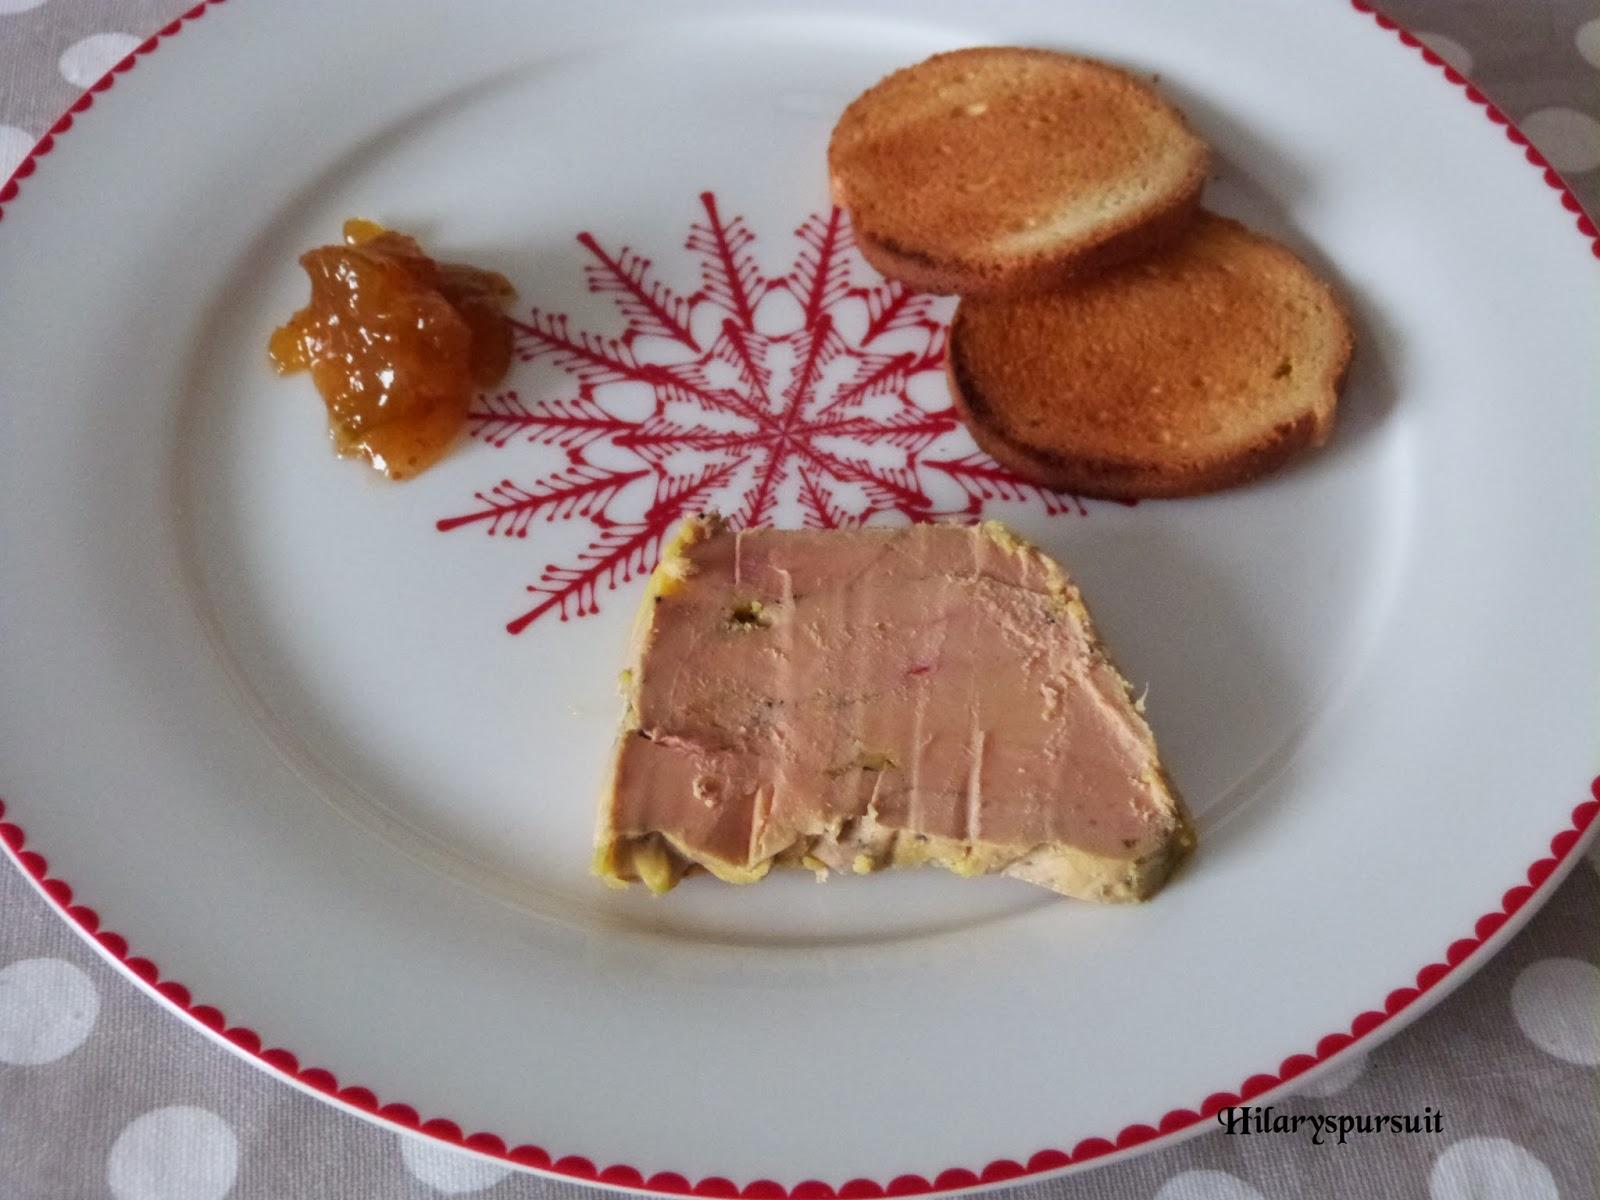 Dans la cuisine d 39 hilary terrine de foie gras maison home made foie gras terrine - Foie gras maison en terrine ...